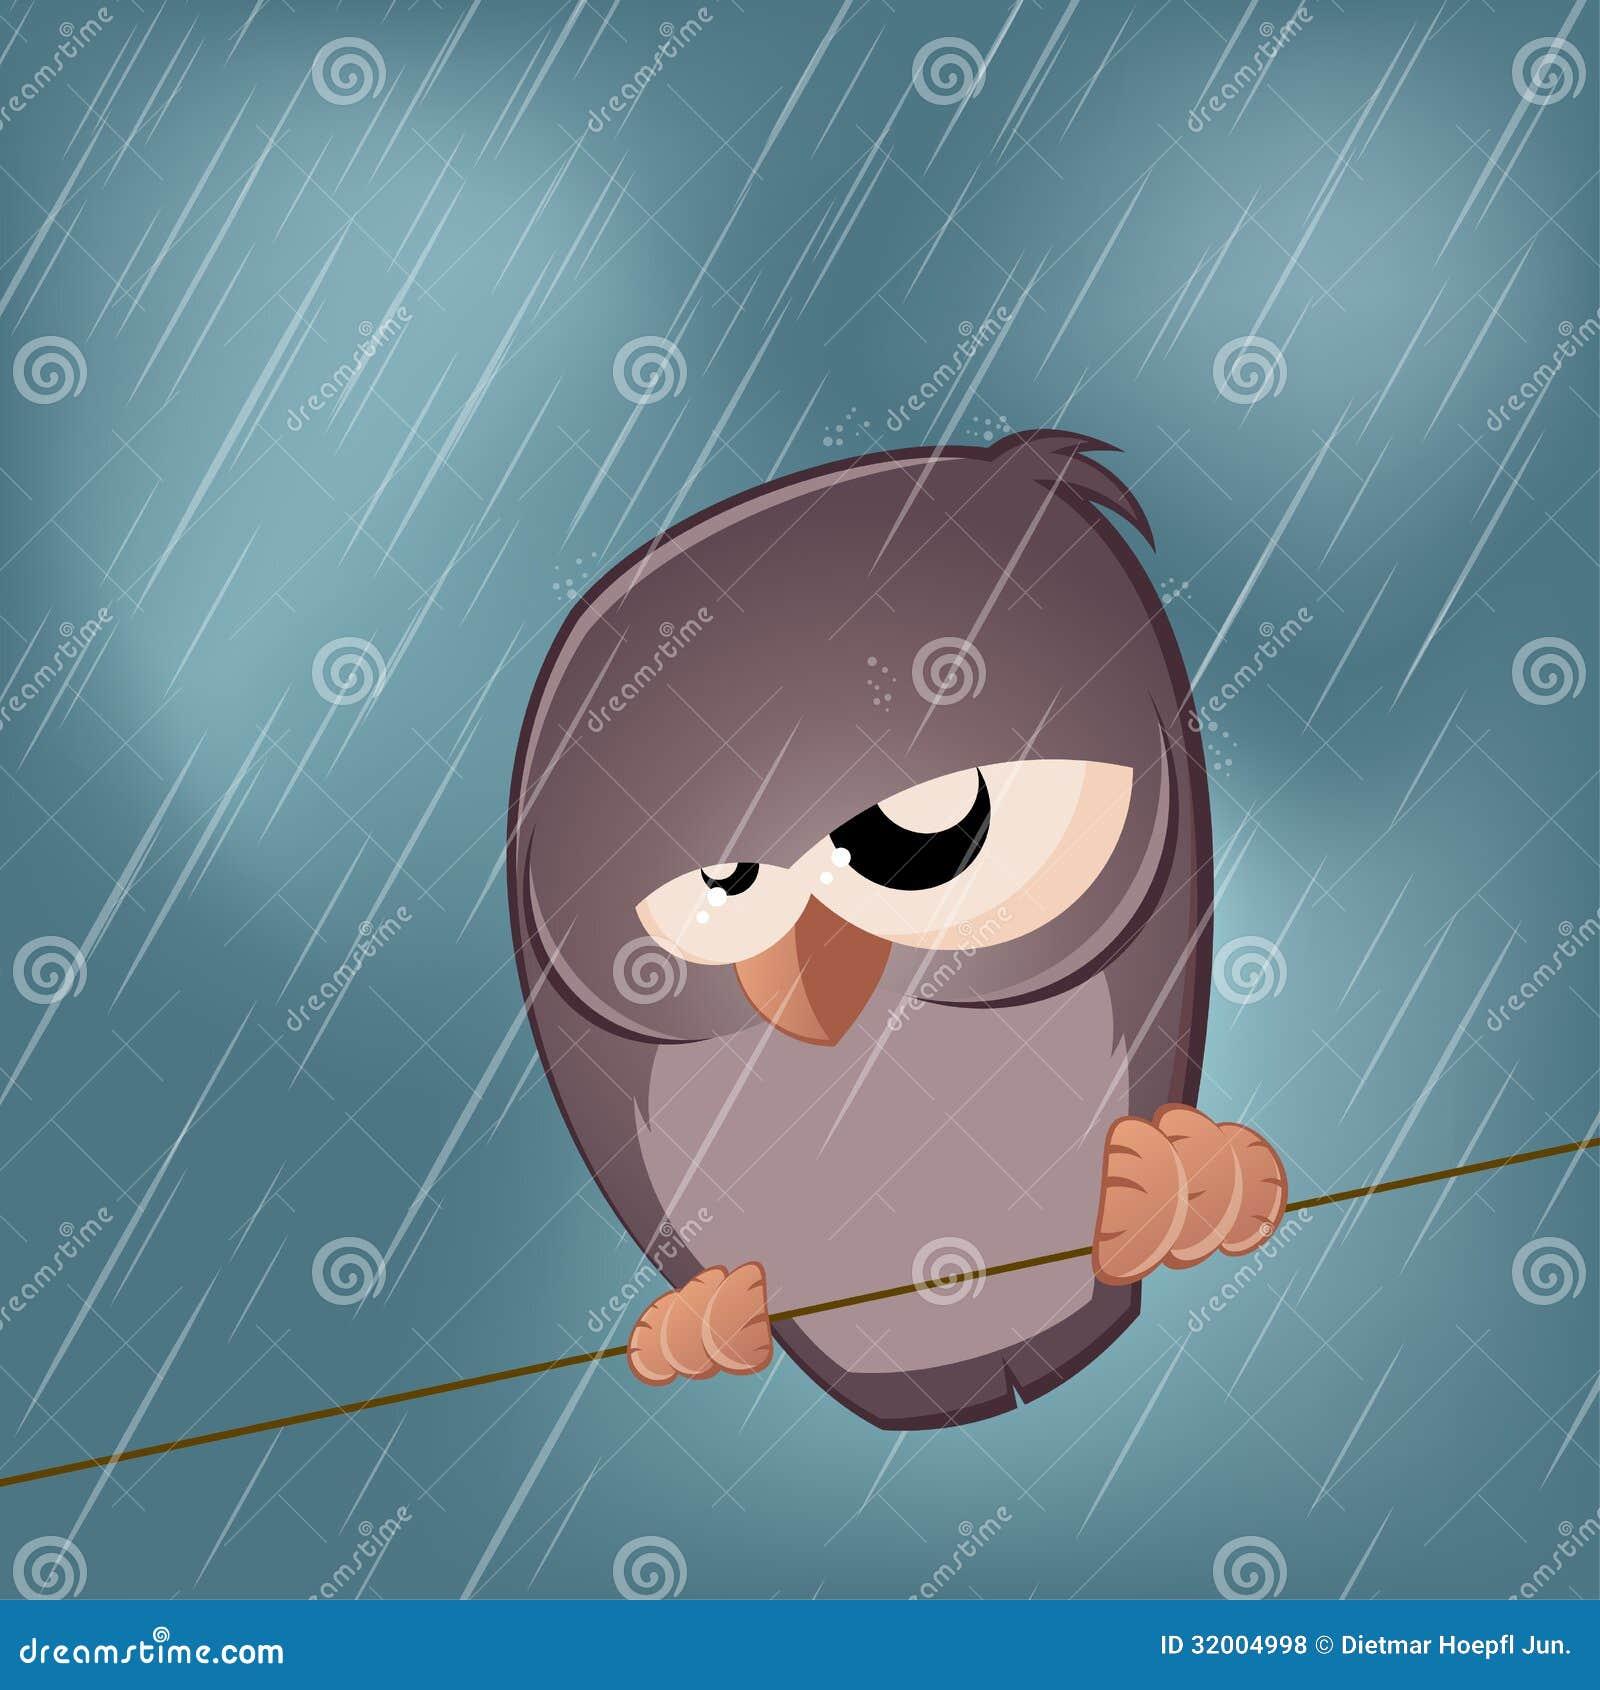 Sad Bird On A Rainy Day Stock Illustration Illustration Of Animal